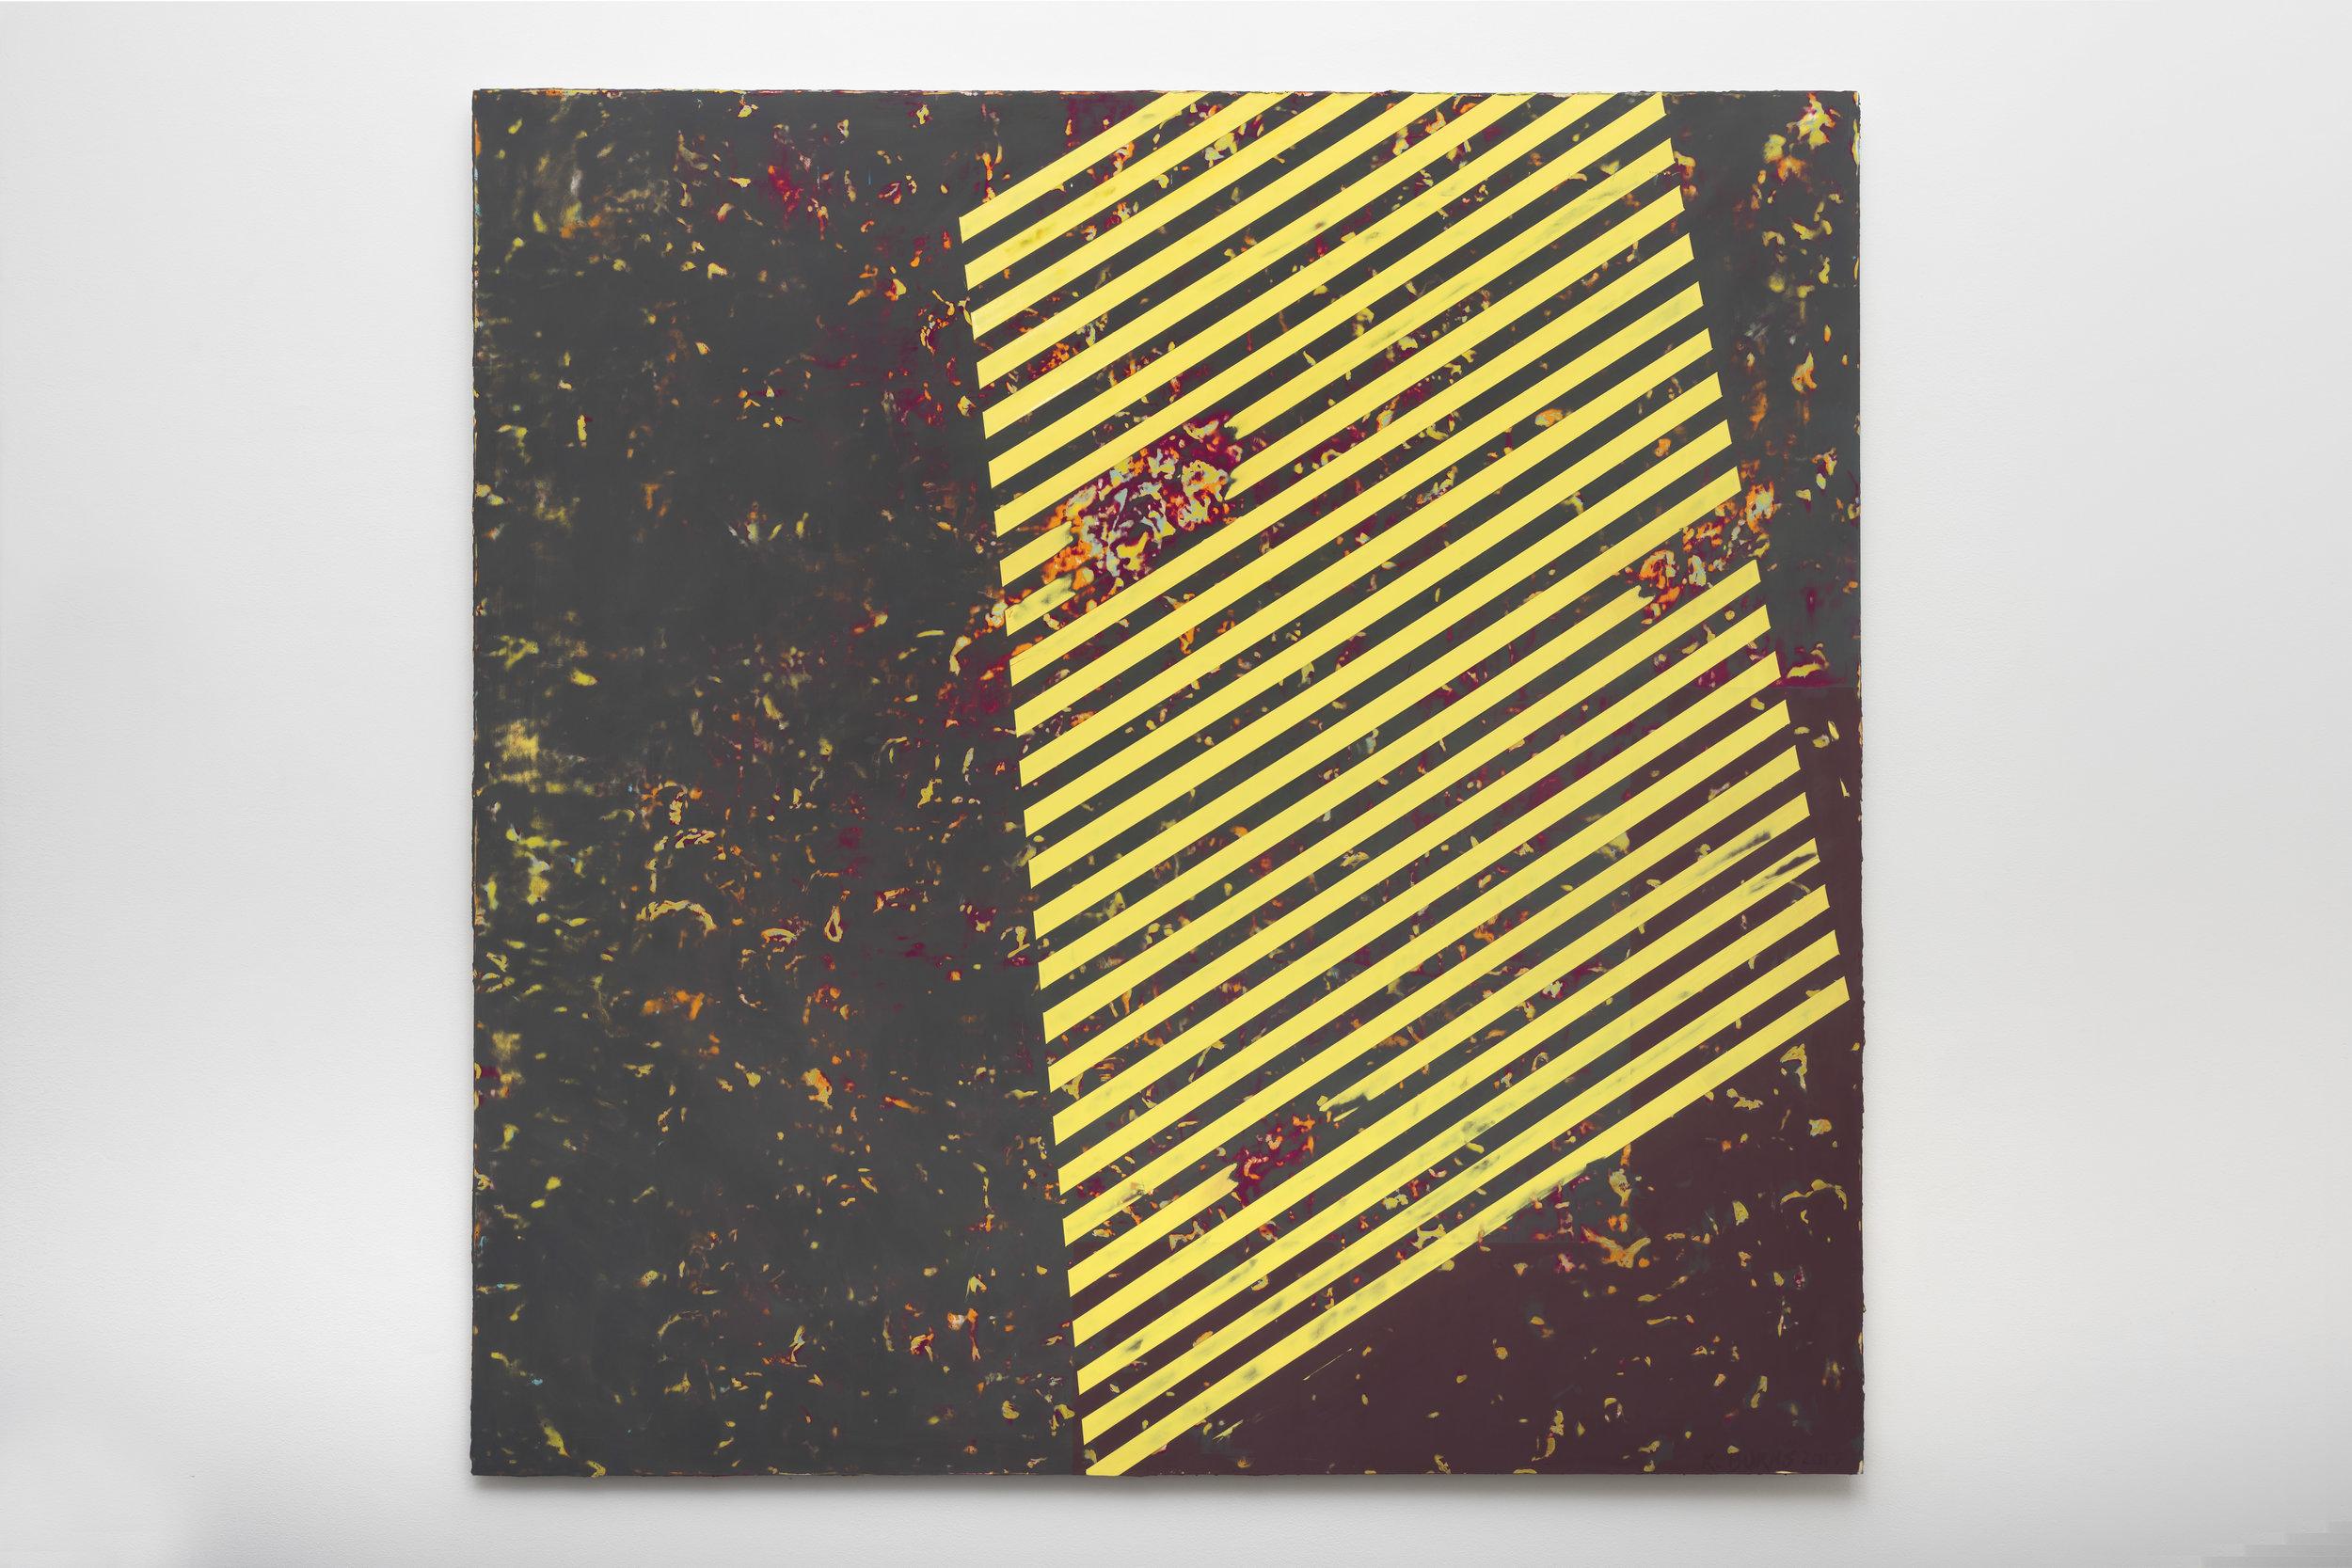 8:01 PM 6/11/17 , 2017  oil on Alu-DiBond 60 x 60 inches; 152.4 x 152.4 centimeters  $20,000.00